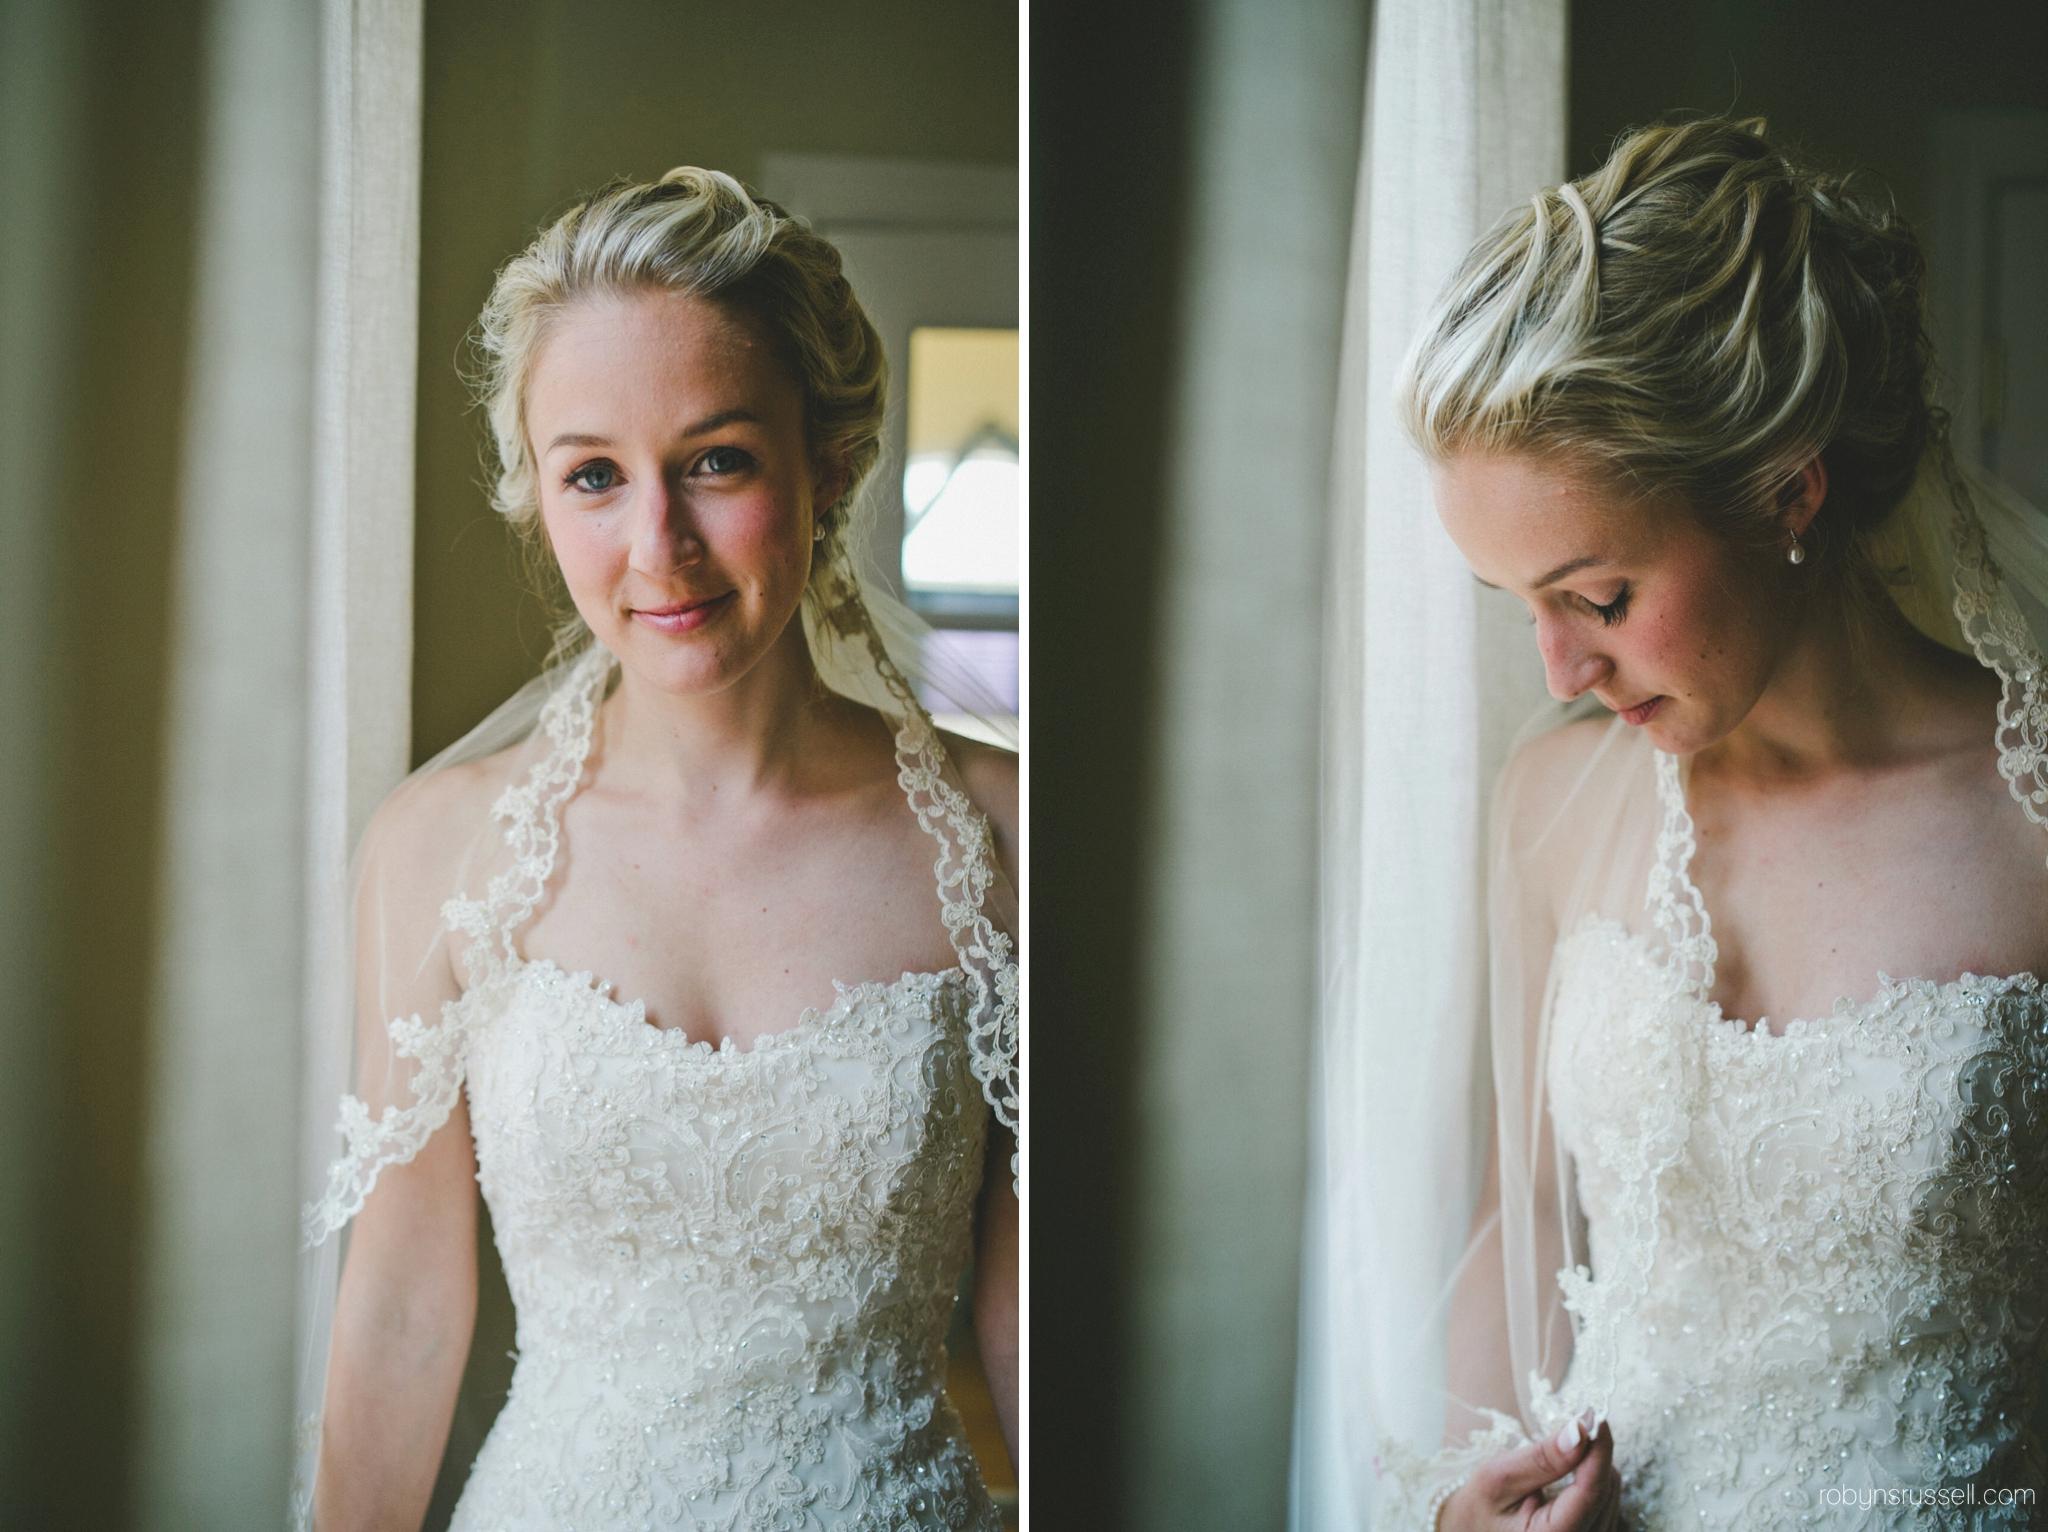 19-gorgeous-bride-oakville-wedding-photographer.jpg